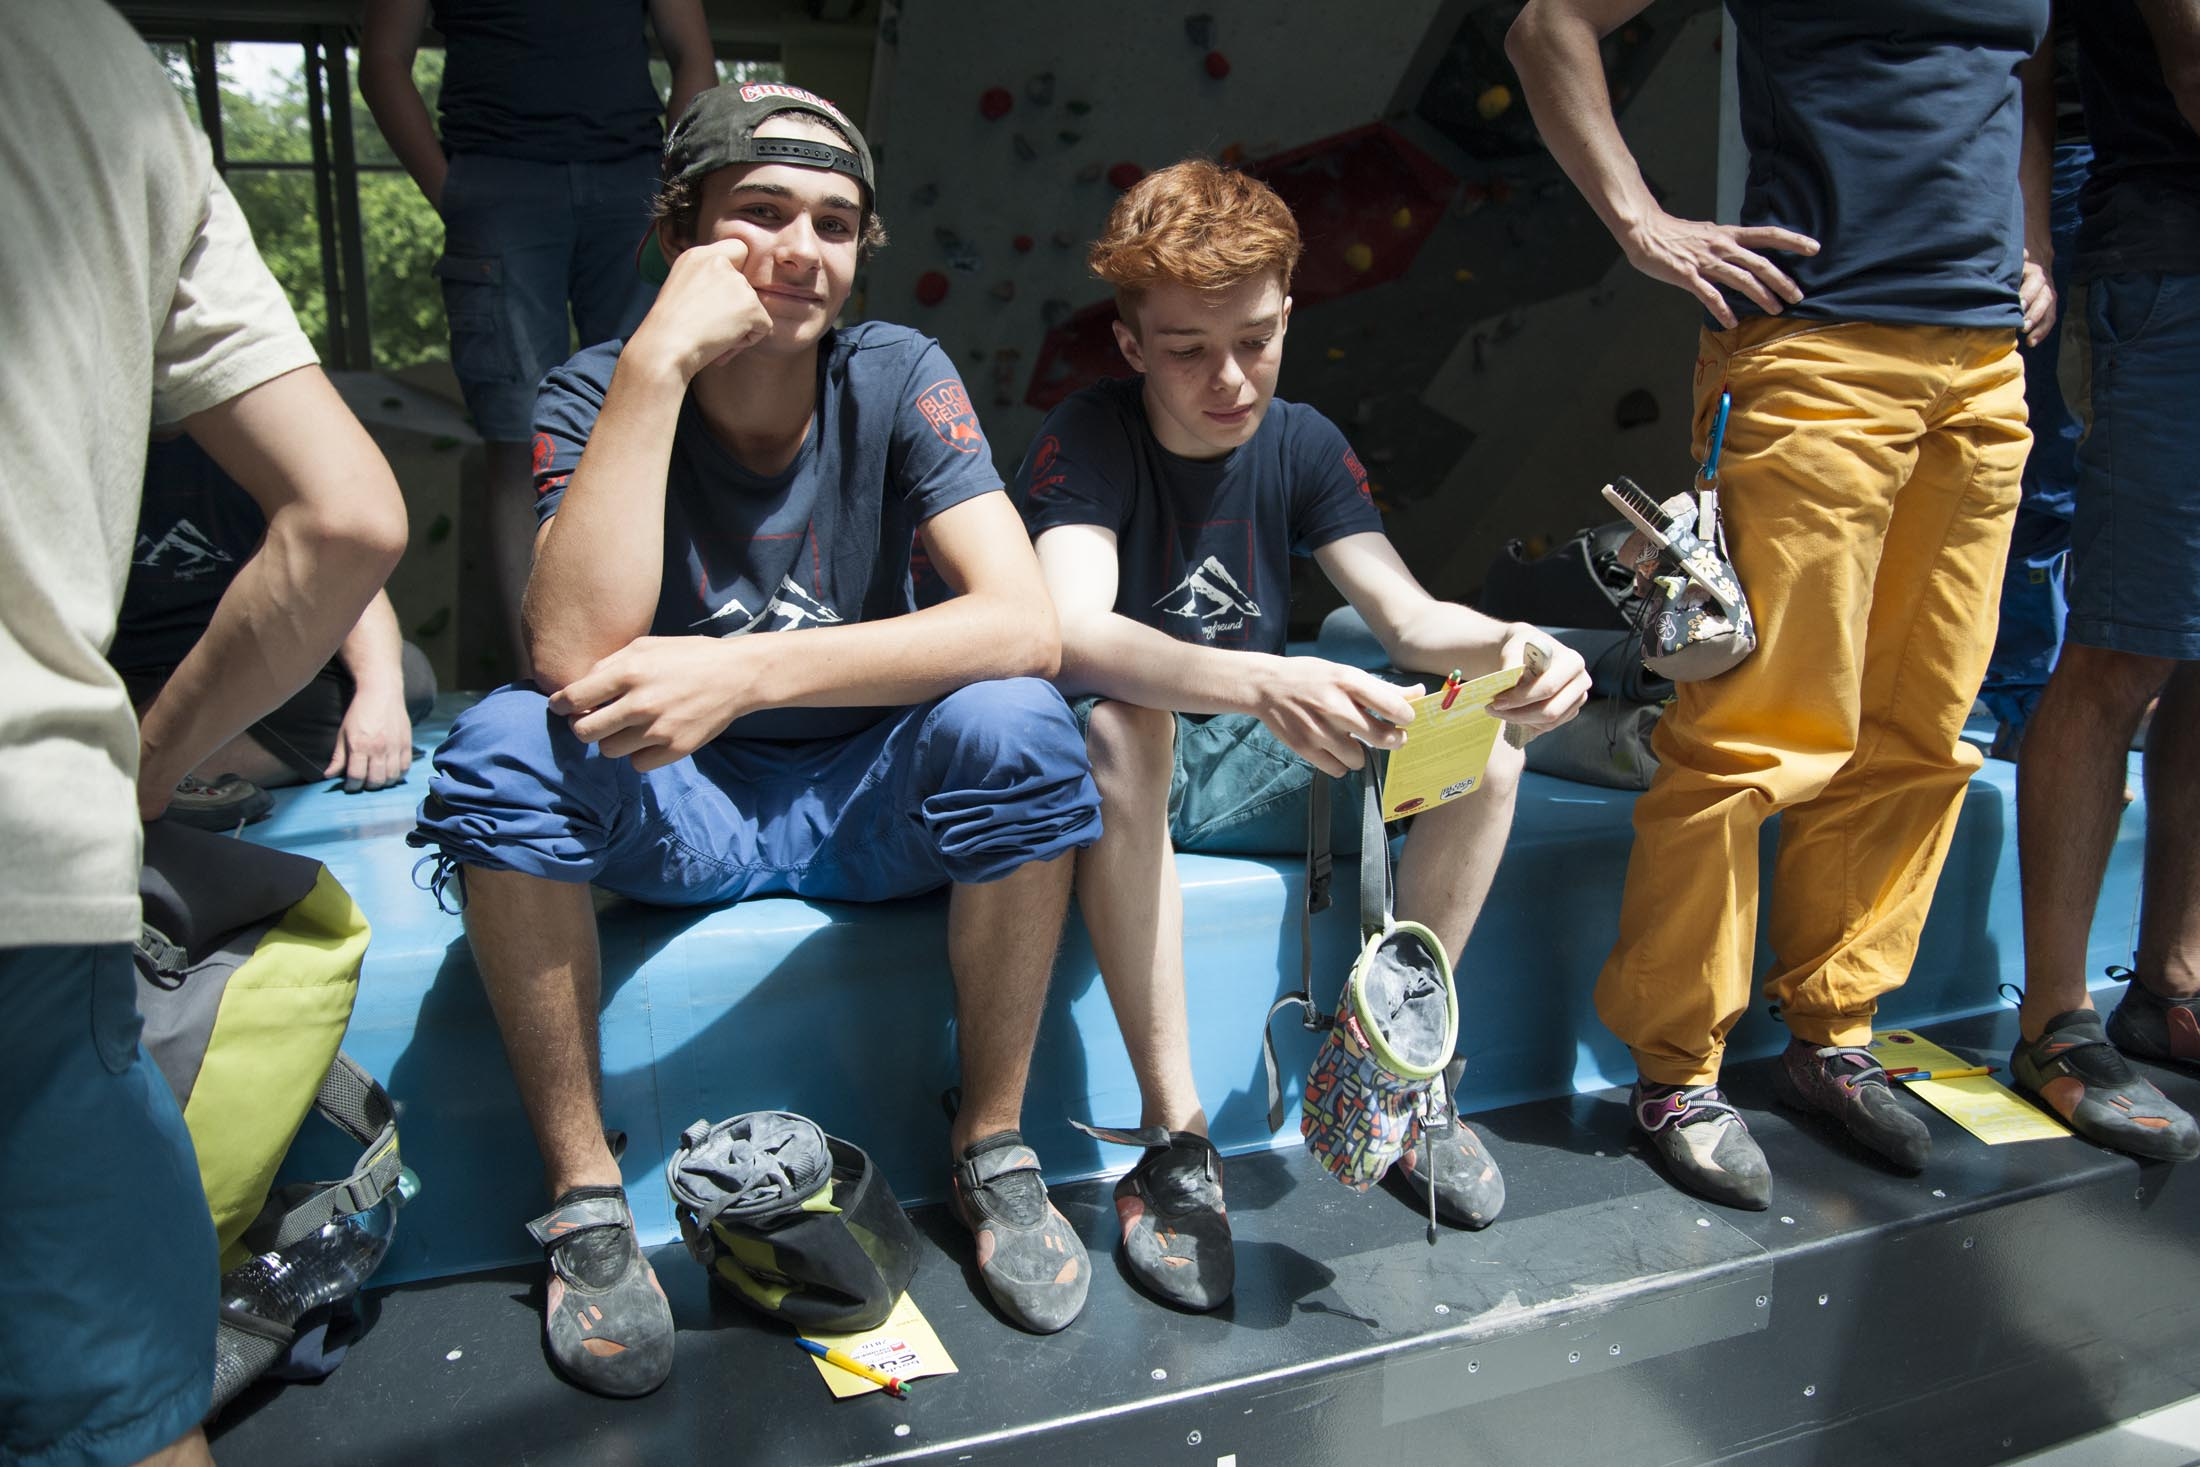 Registration internationaler bouldercup Frankenjura 2016, BLOCKHELDEN Erlangen, Mammut, Bergfreunde.de, Boulderwettkampf07092016094